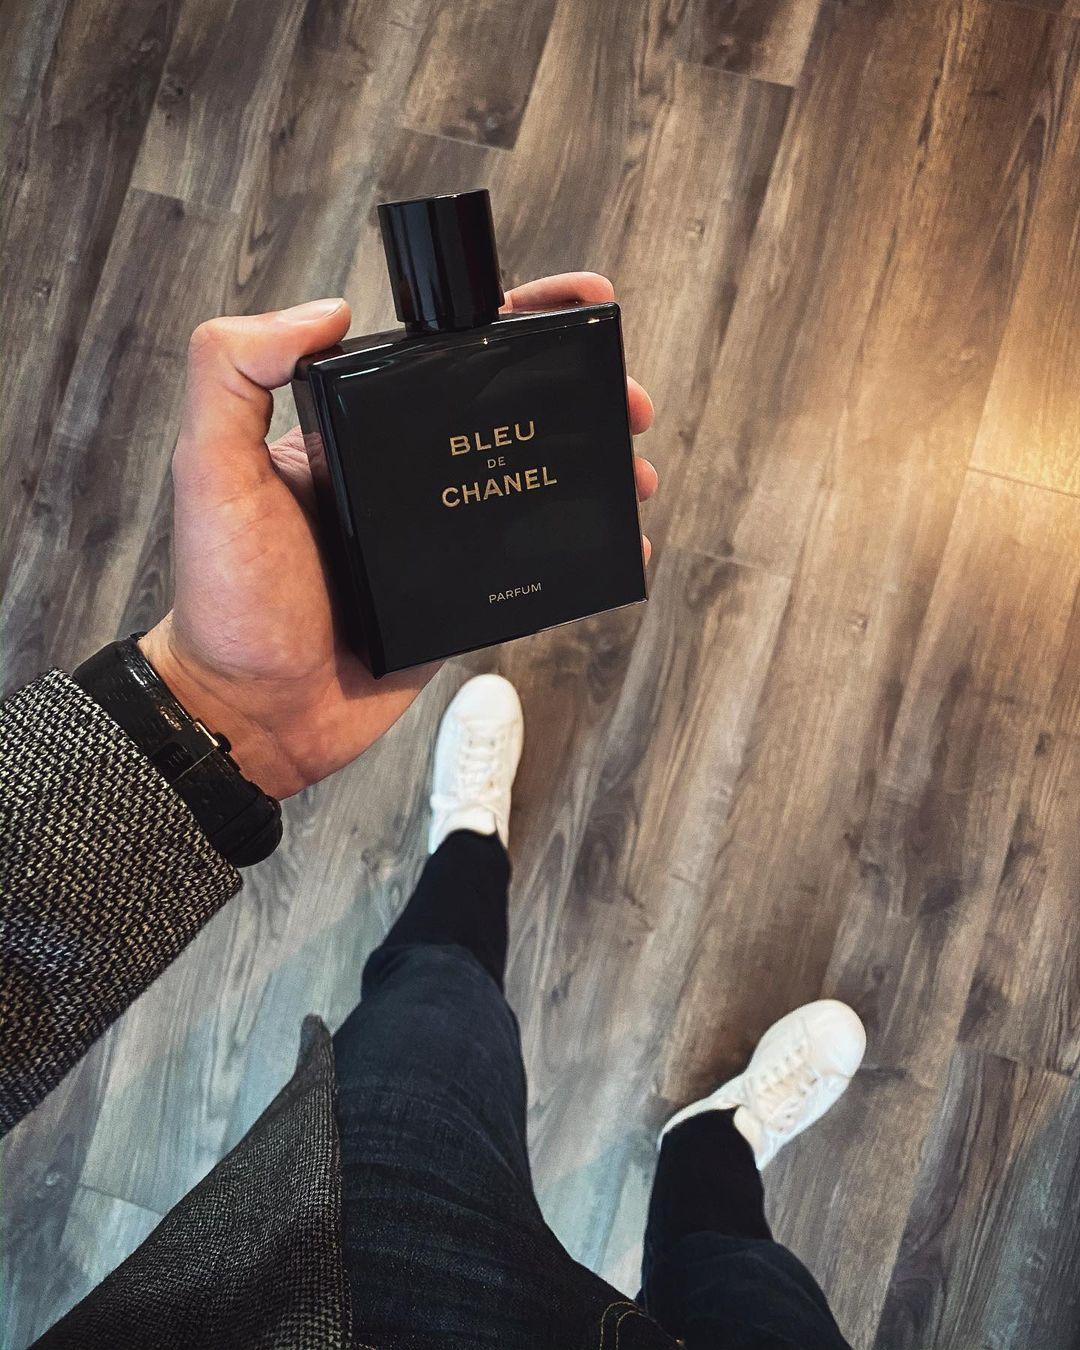 nuoc hoa bleu de chanel parfum